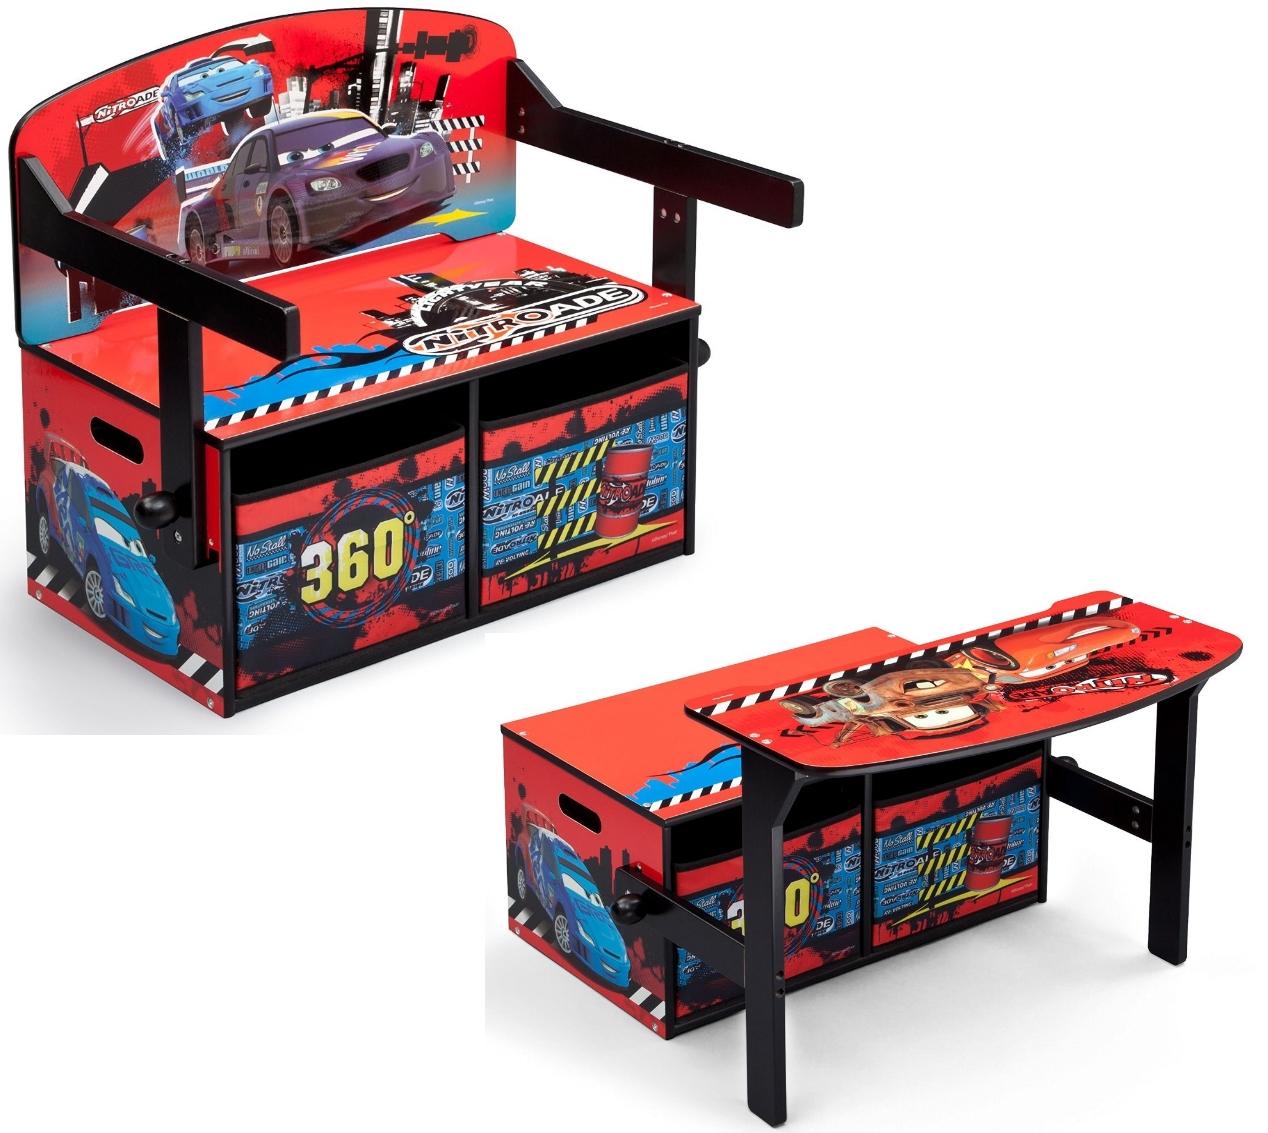 Kindersitzbank disney truhe spielzeugtruhe spielzeugkiste